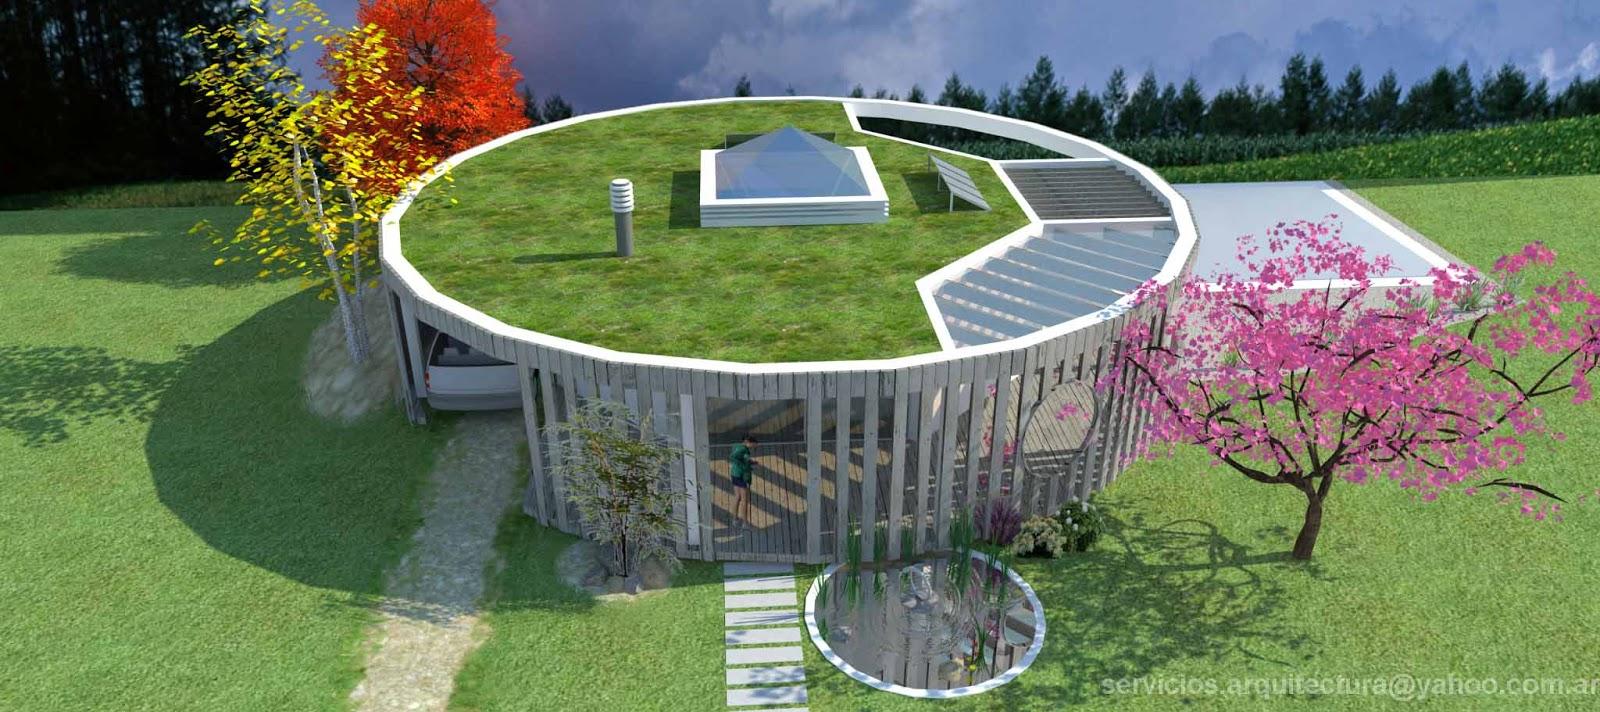 Arquitectura y feng shui 01 01 2013 02 01 2013 - Arquitectura y feng shui ...